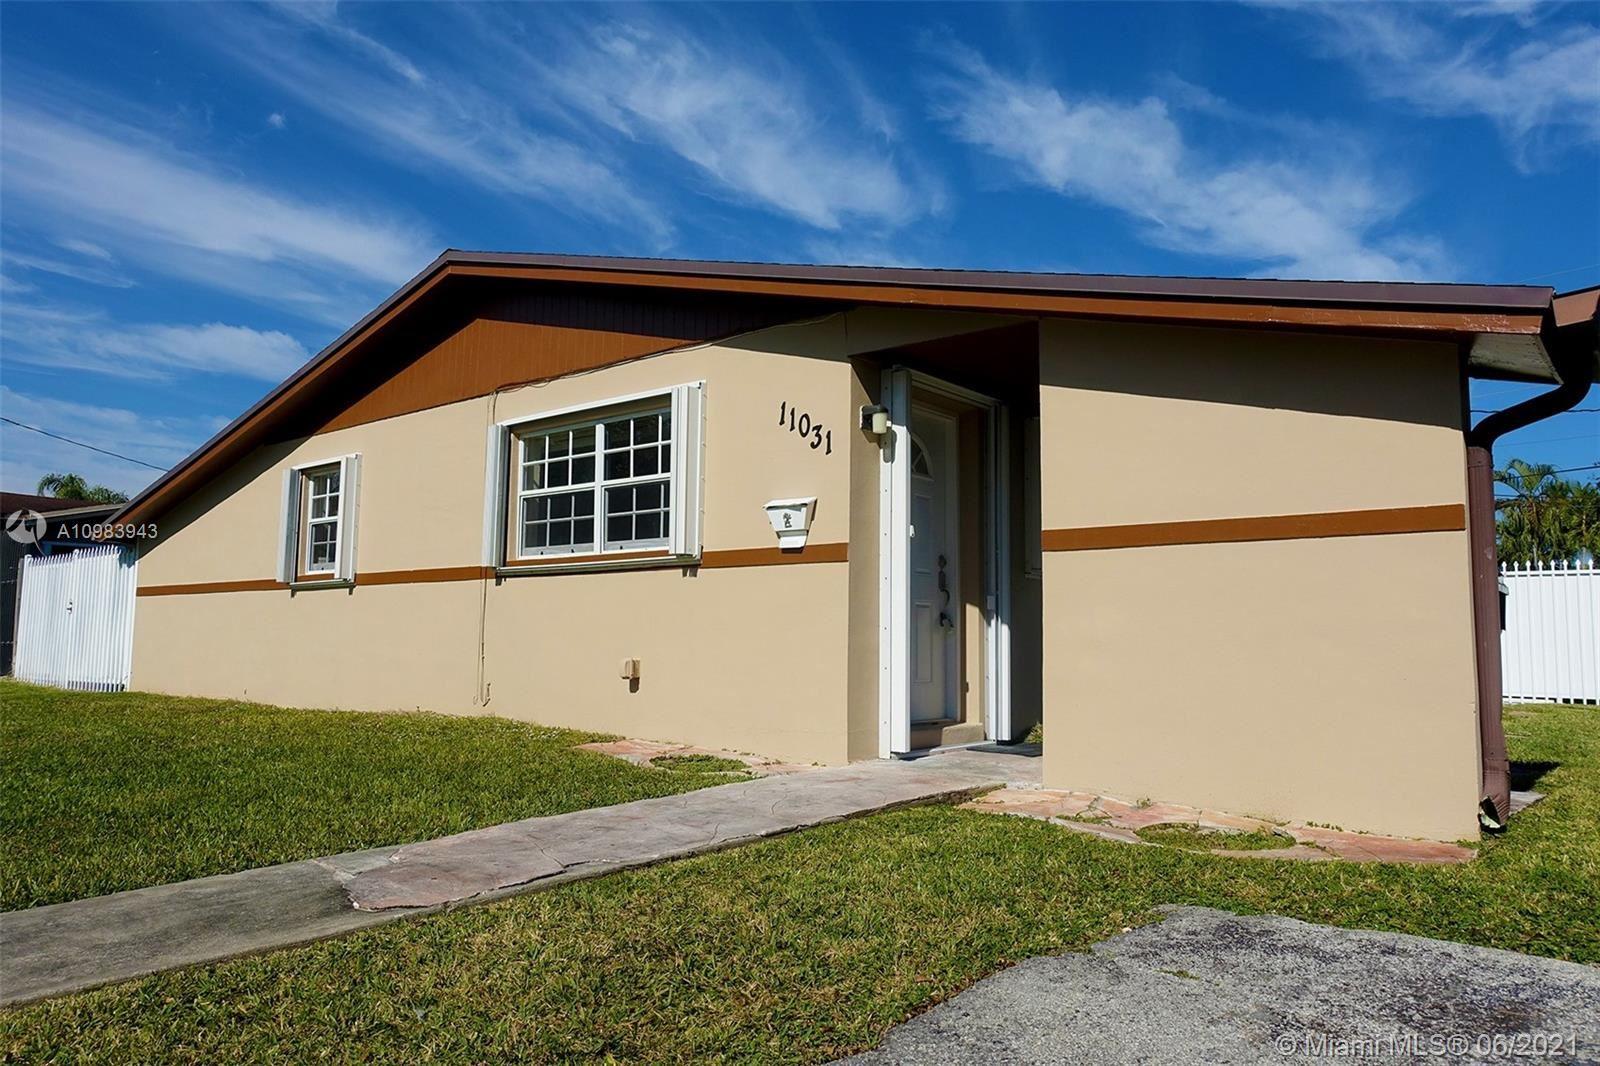 11031 N Snapper Creek Dr, Miami, FL 33173 - #: A10983943